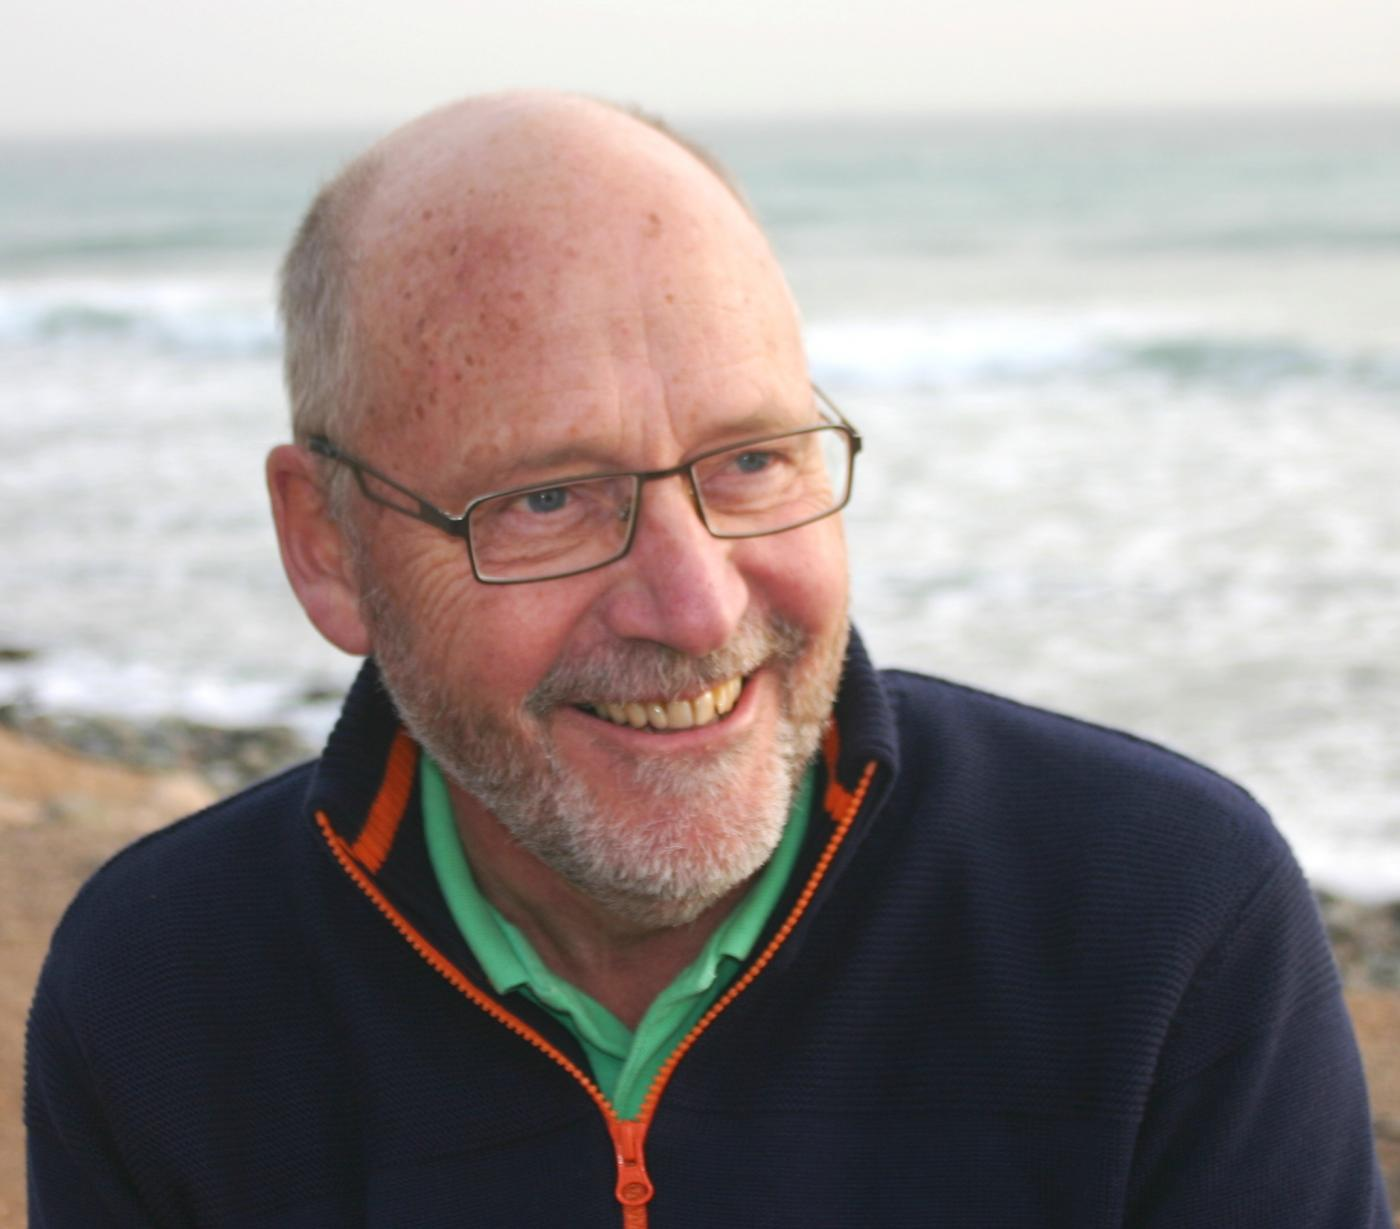 Anders Ljungkvist